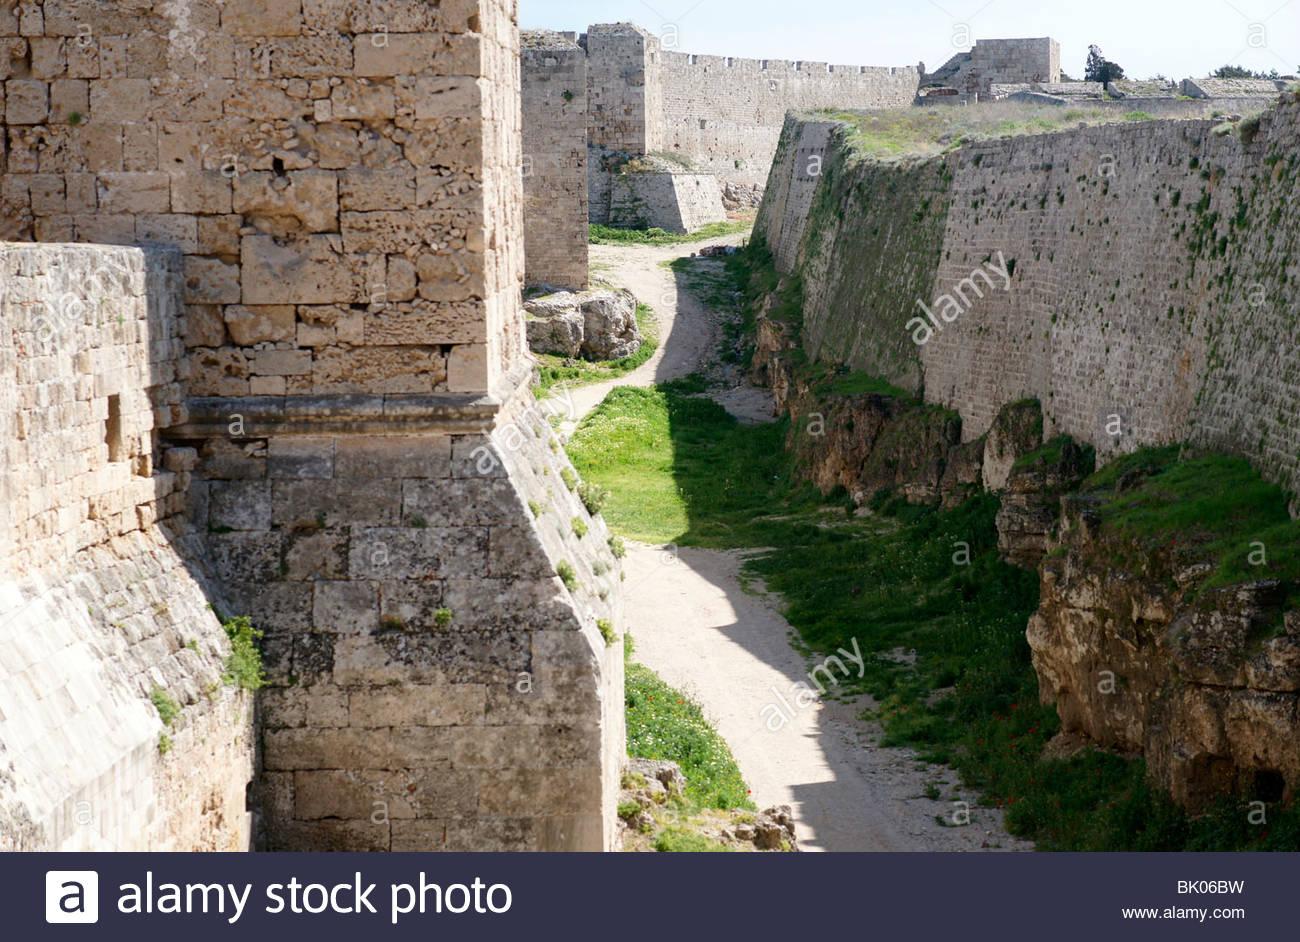 MOAT RHODES CASTLE GREECE - Stock Image